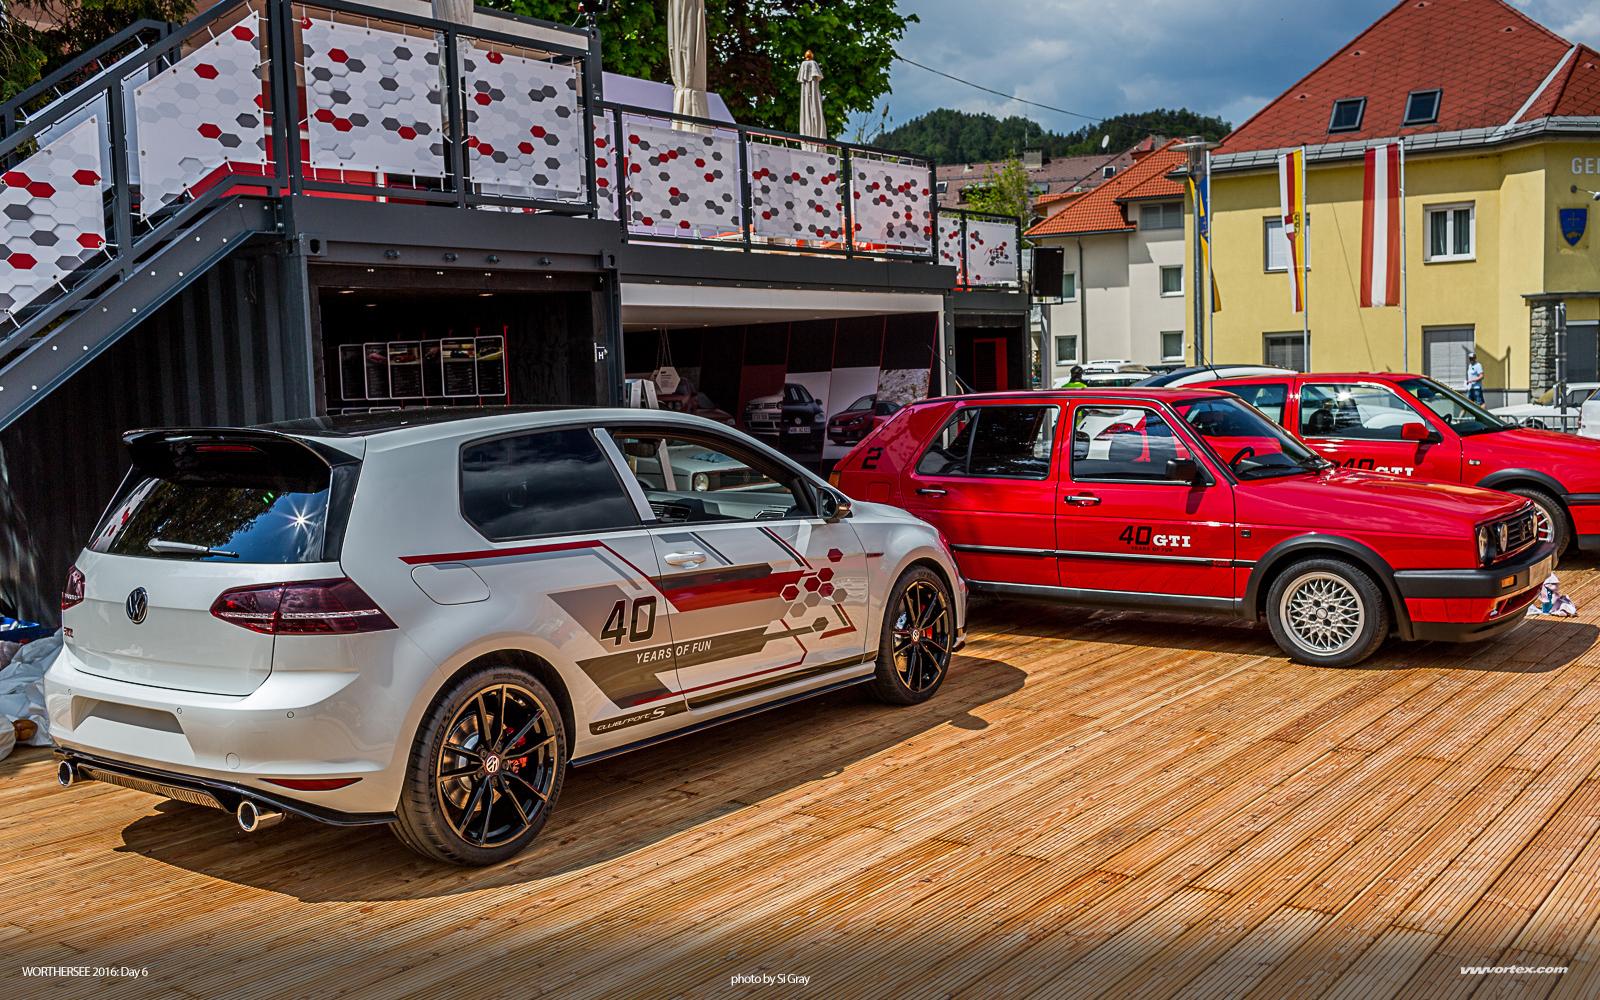 Audi RS4 Avant red 2 110x60 photo